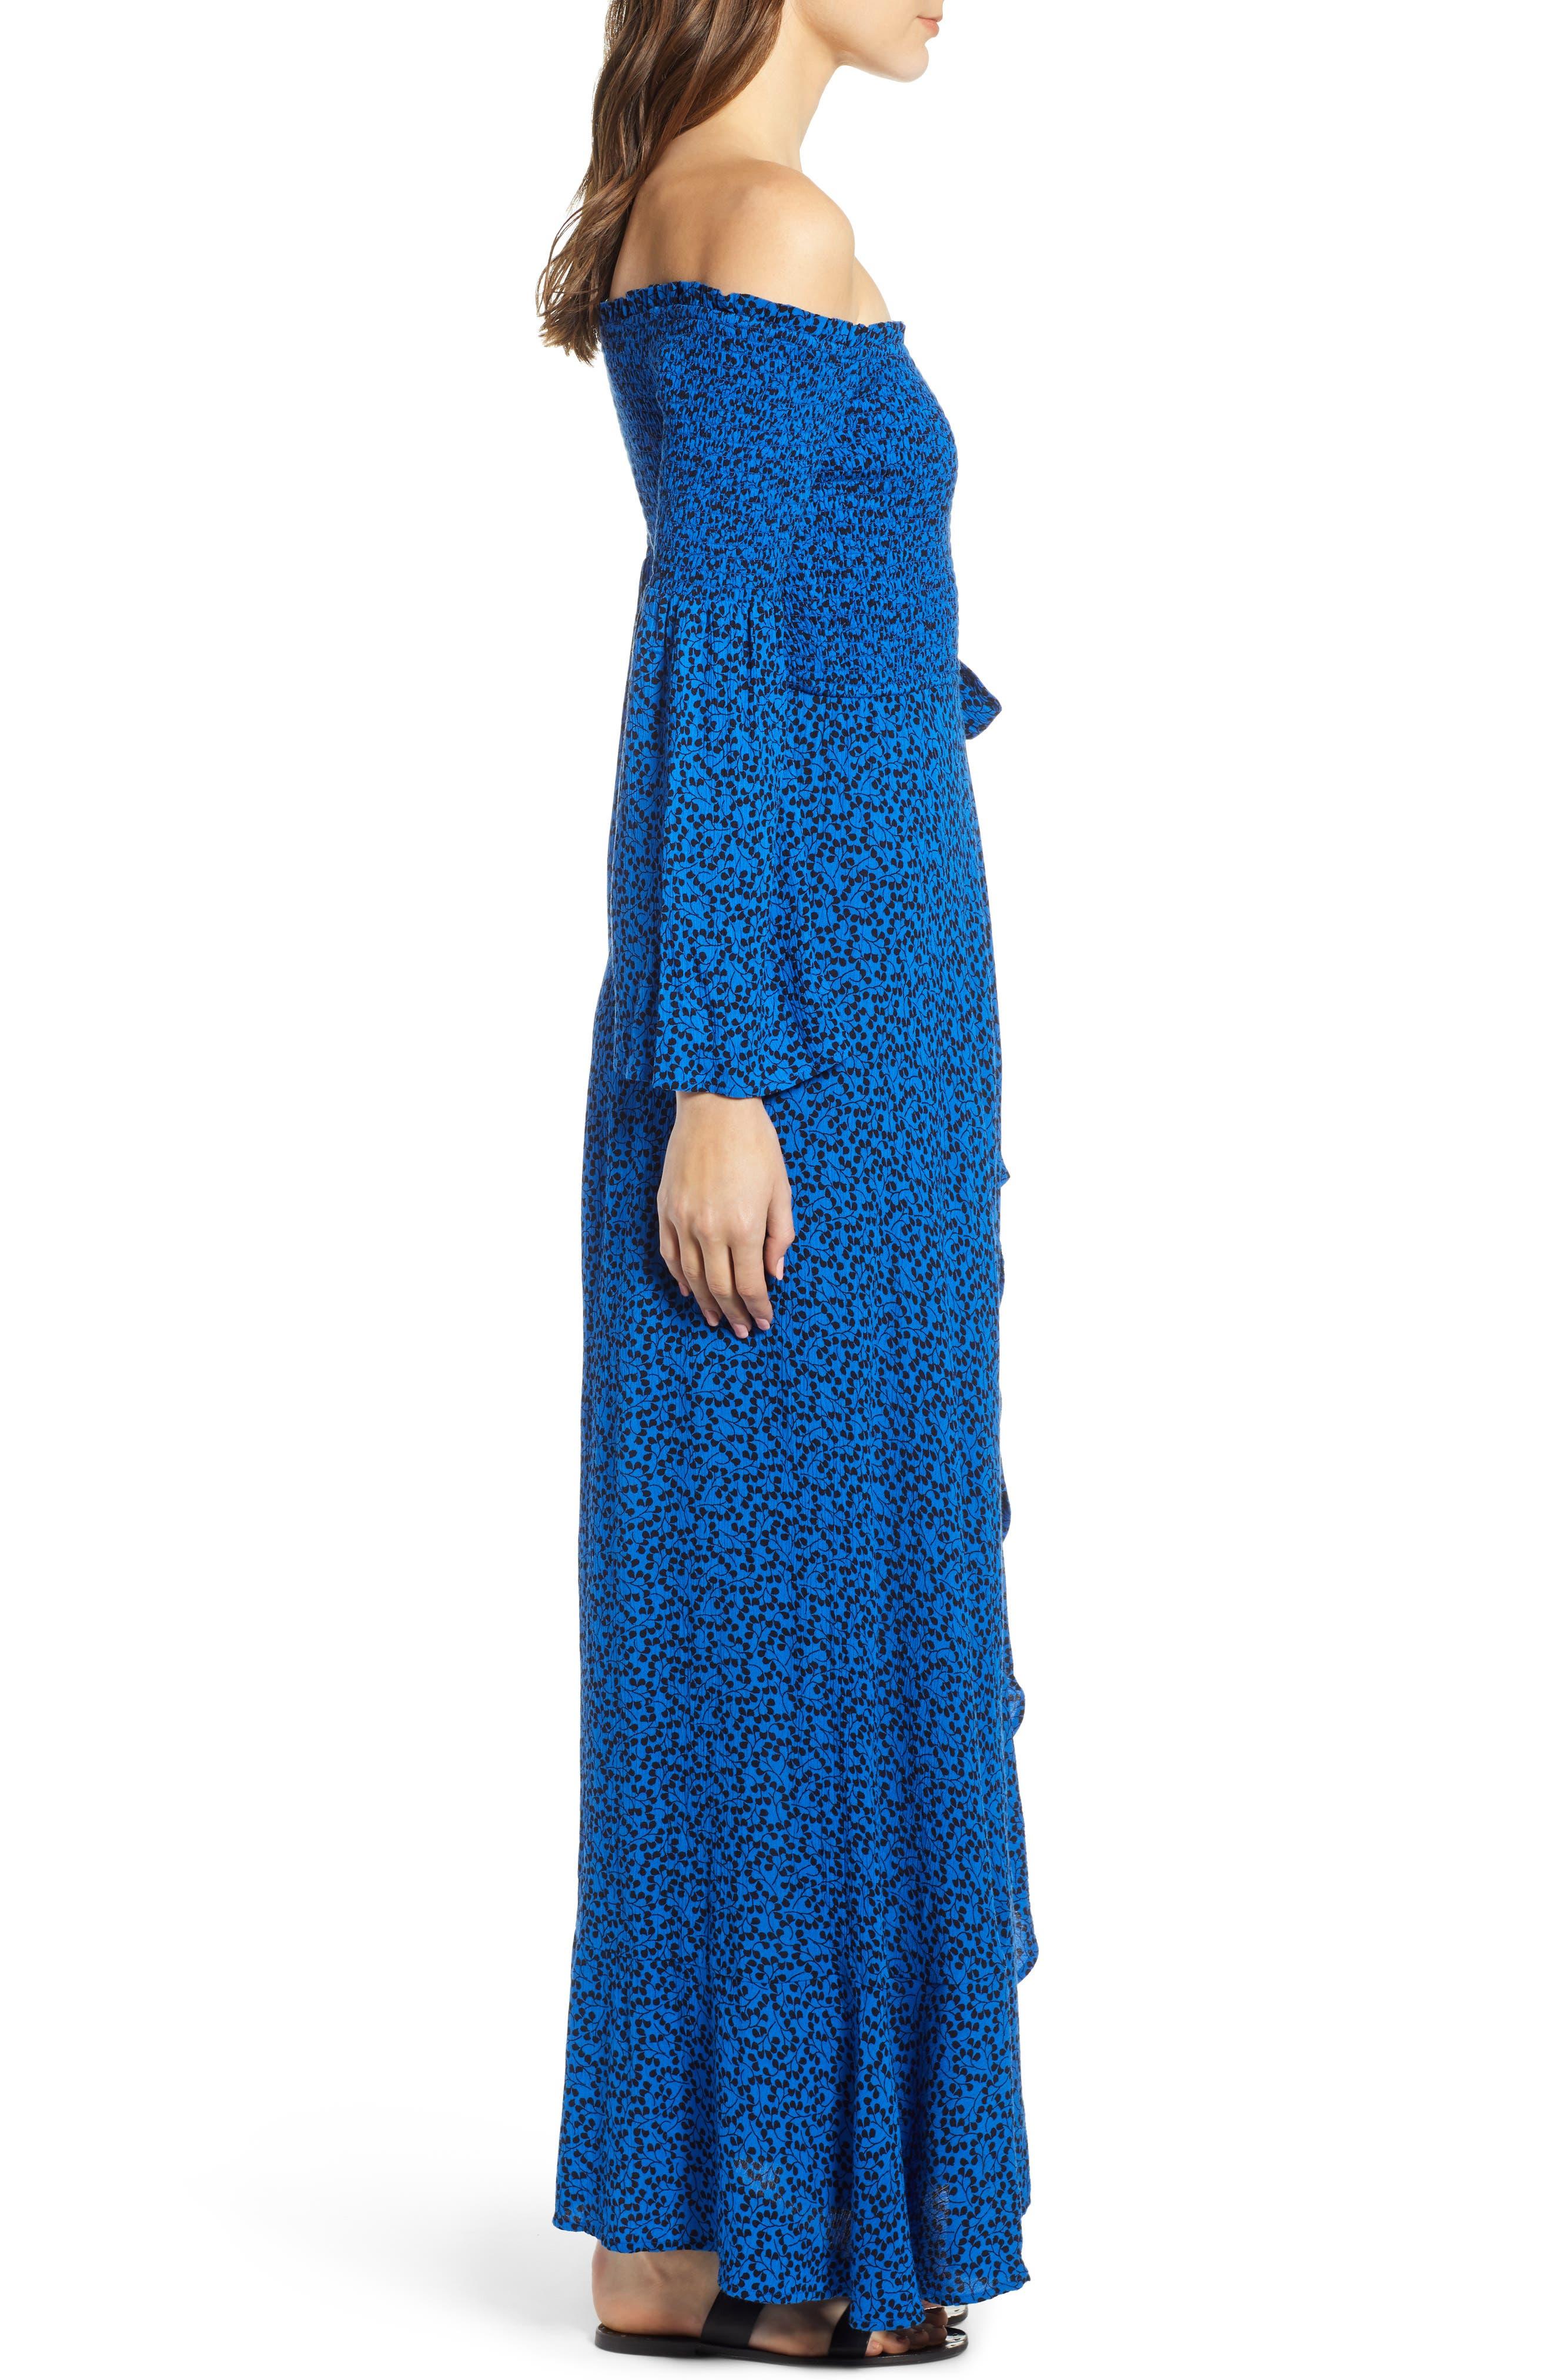 Bali Off The Shoulder Maxi Dress,                             Alternate thumbnail 3, color,                             ROYAL/ BLACK